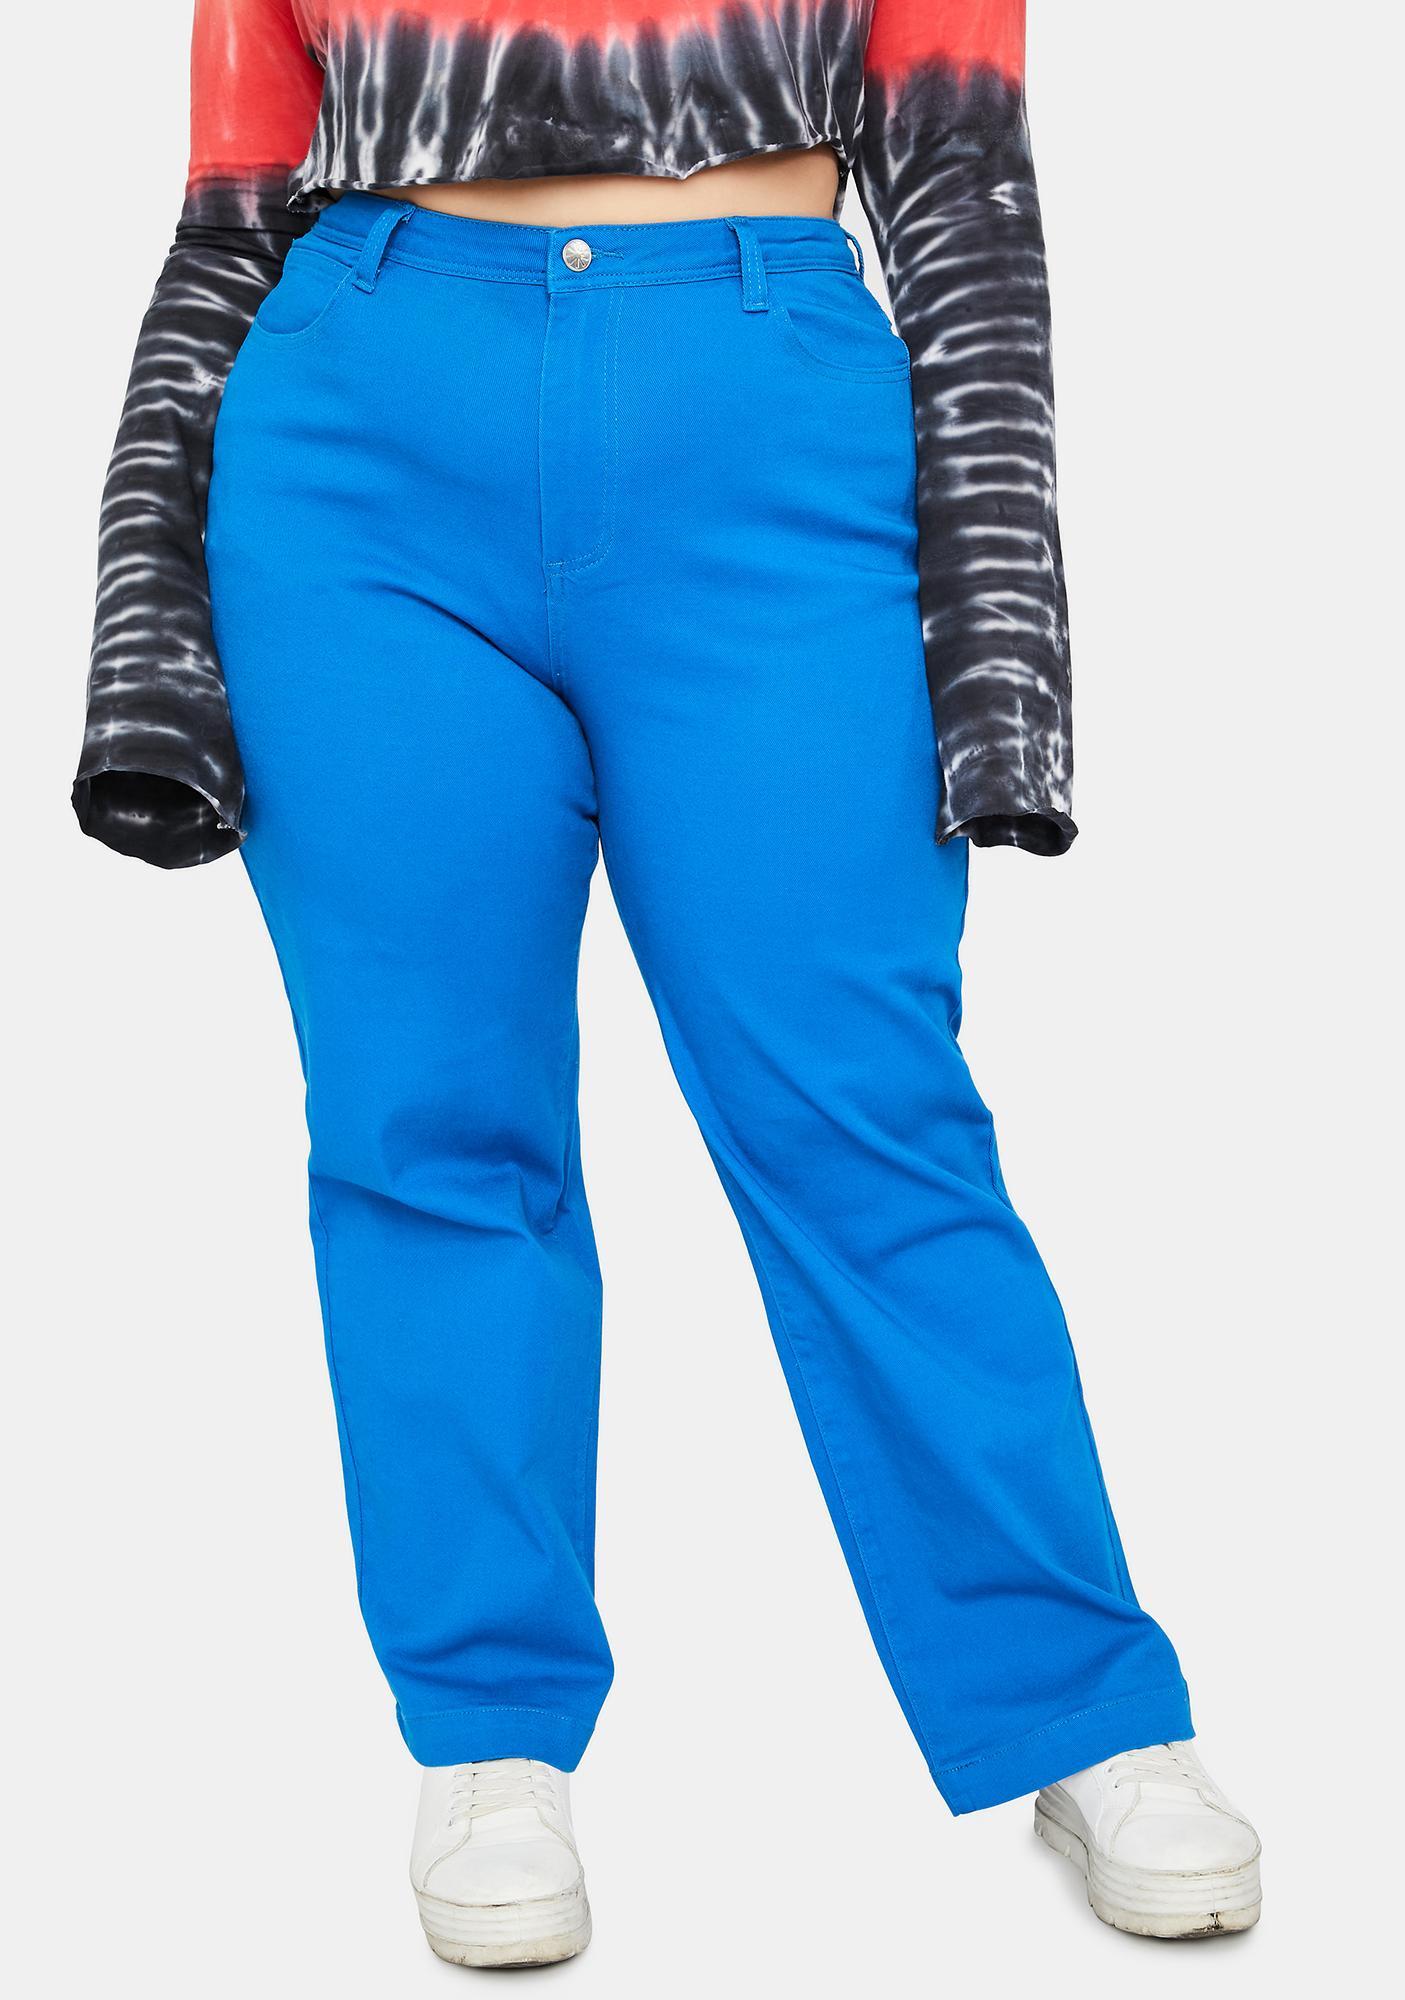 dELiA*s by Dolls Kill Truly Frozen Over Carpenter Pants